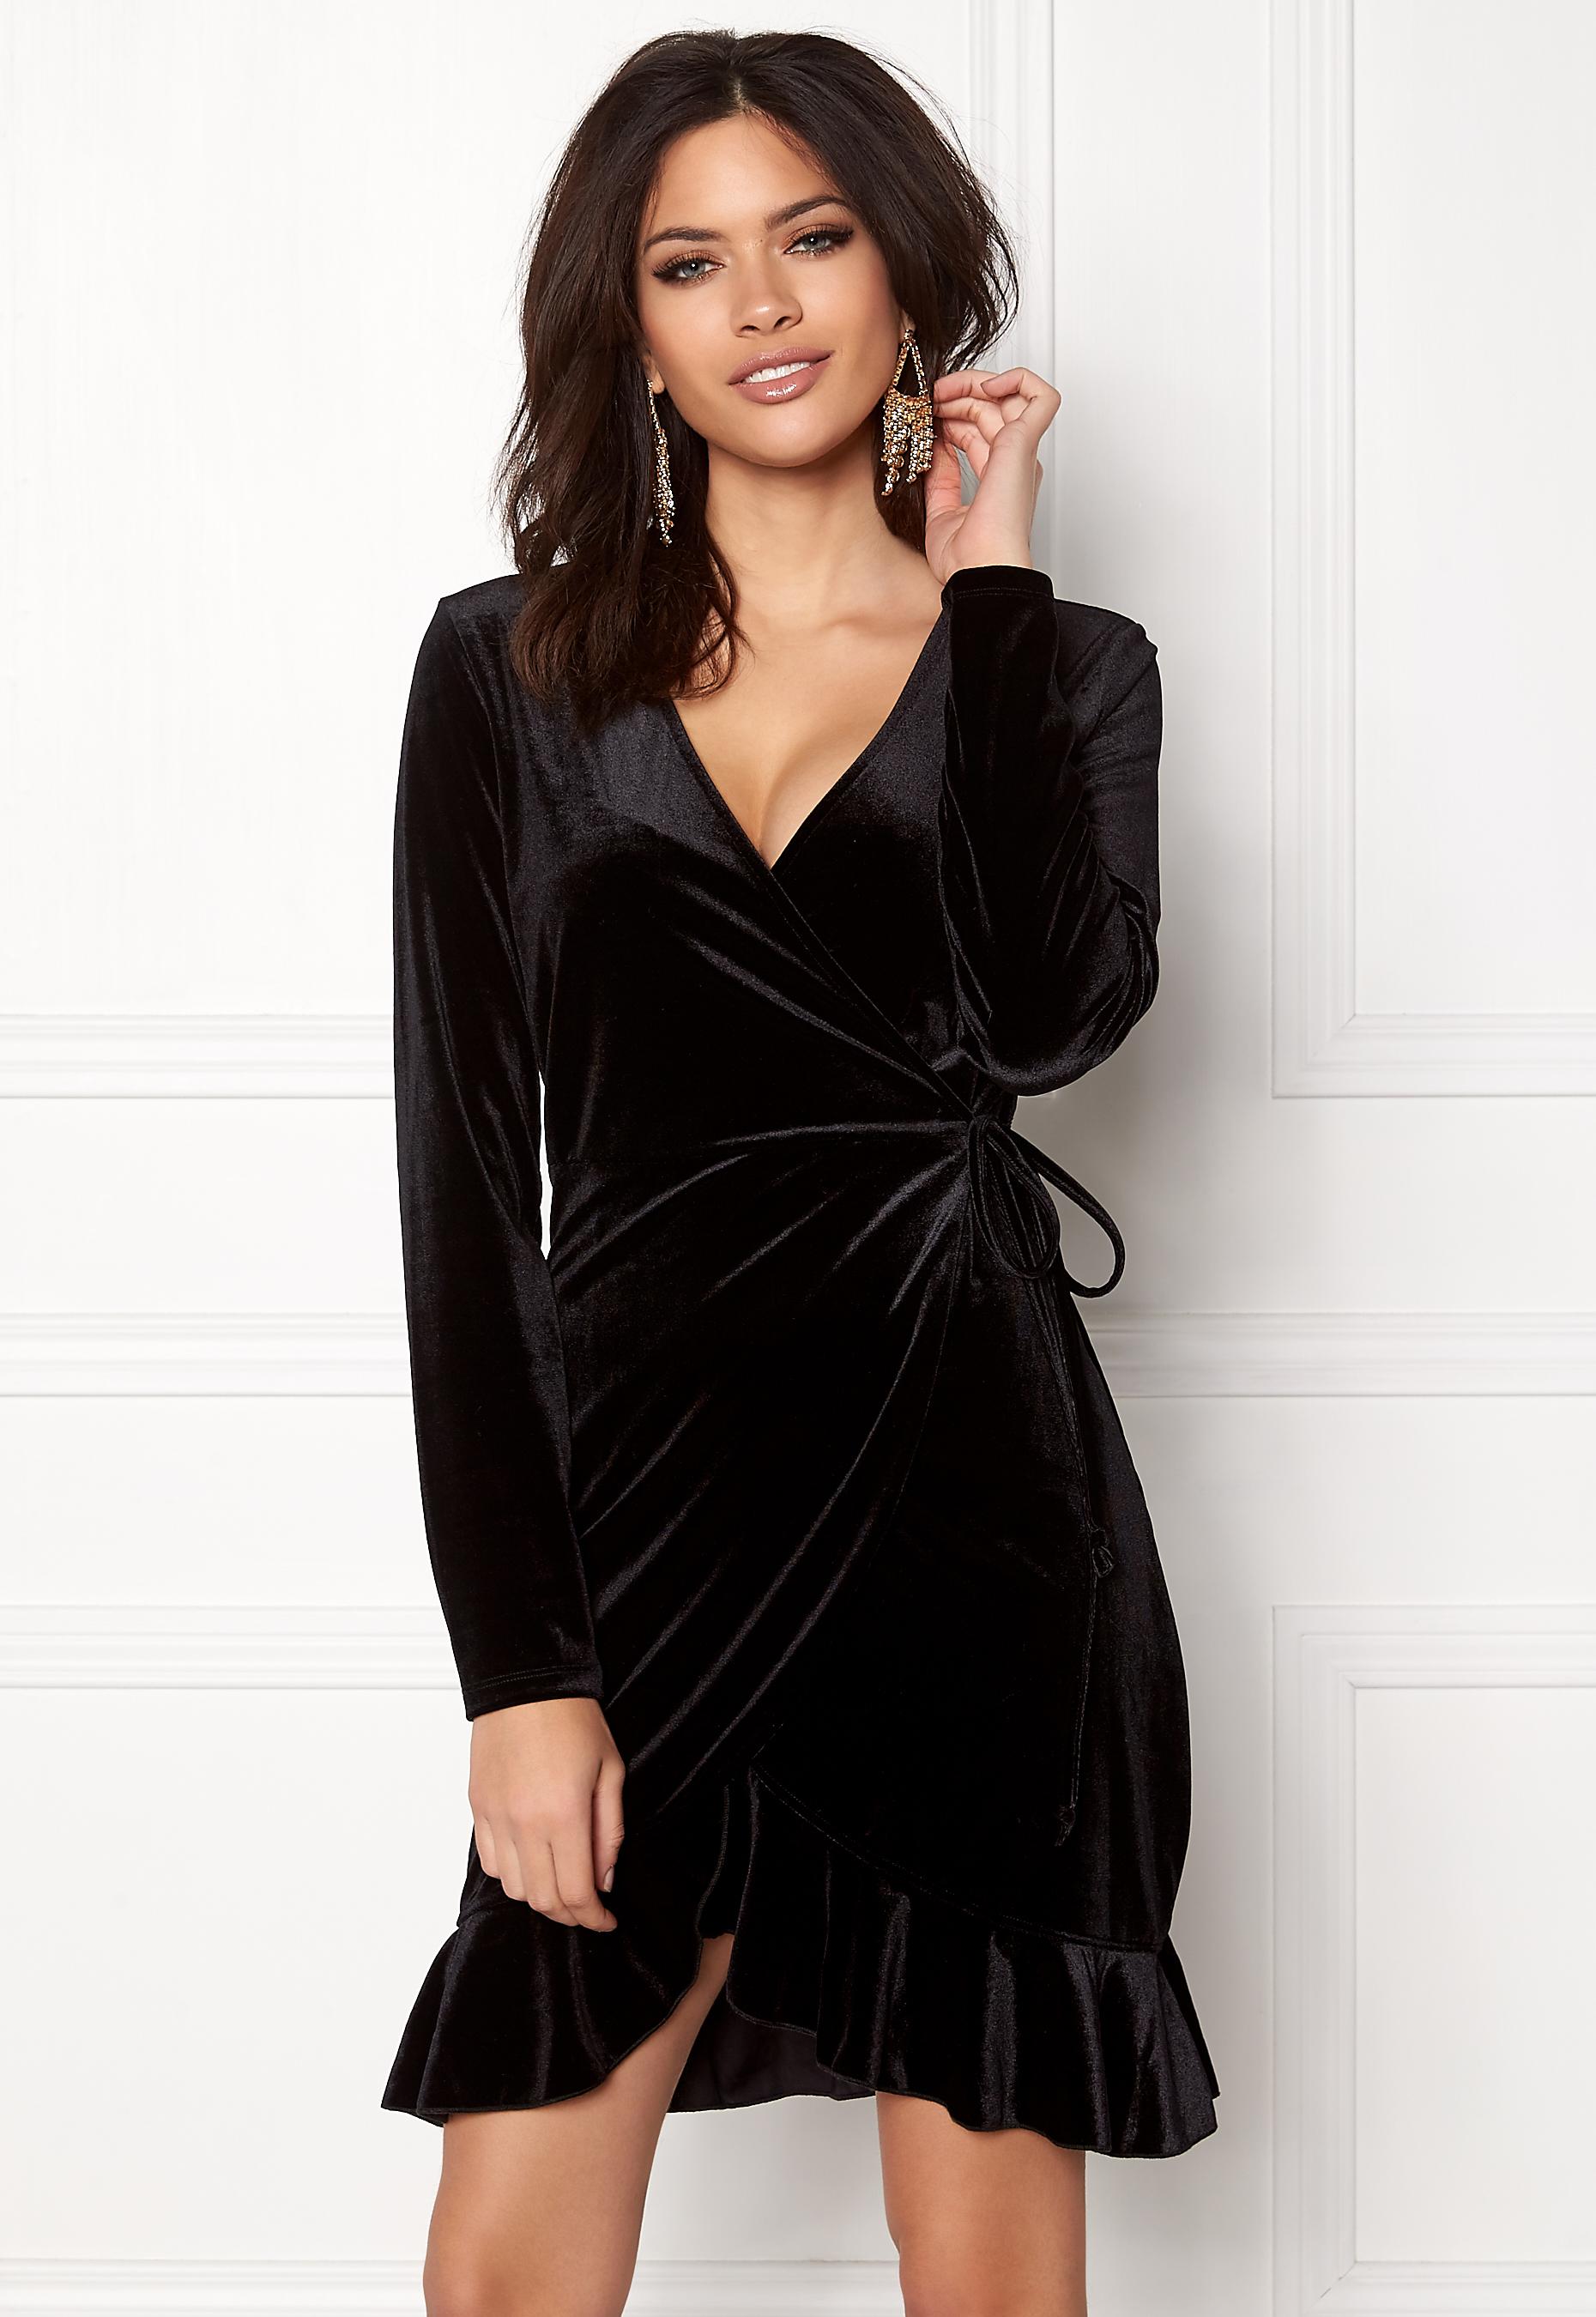 fbad0f8589b1d VERO MODA Viola Wrap L/S Dress Black - Bubbleroom